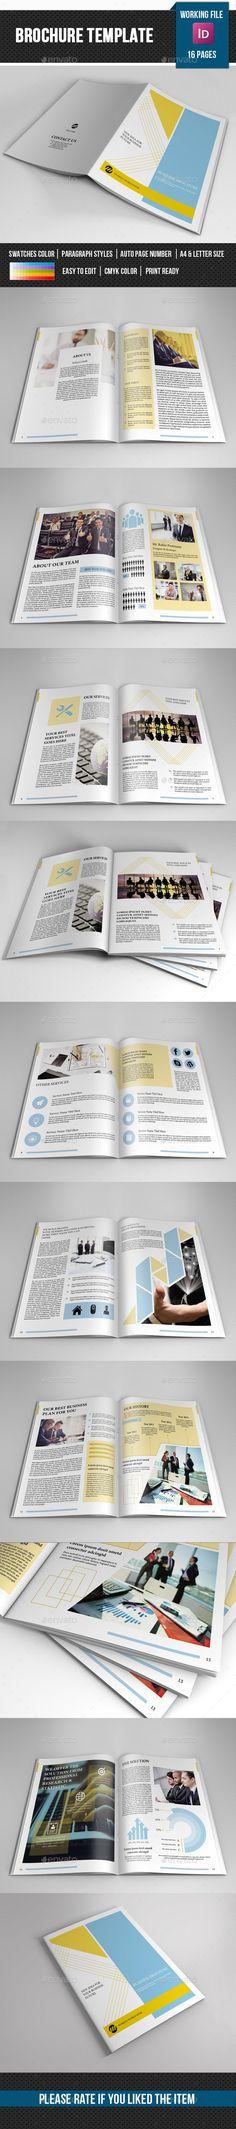 The Creative Brochure - Landscape Vol2 Brochures, Indesign - corporate brochure template